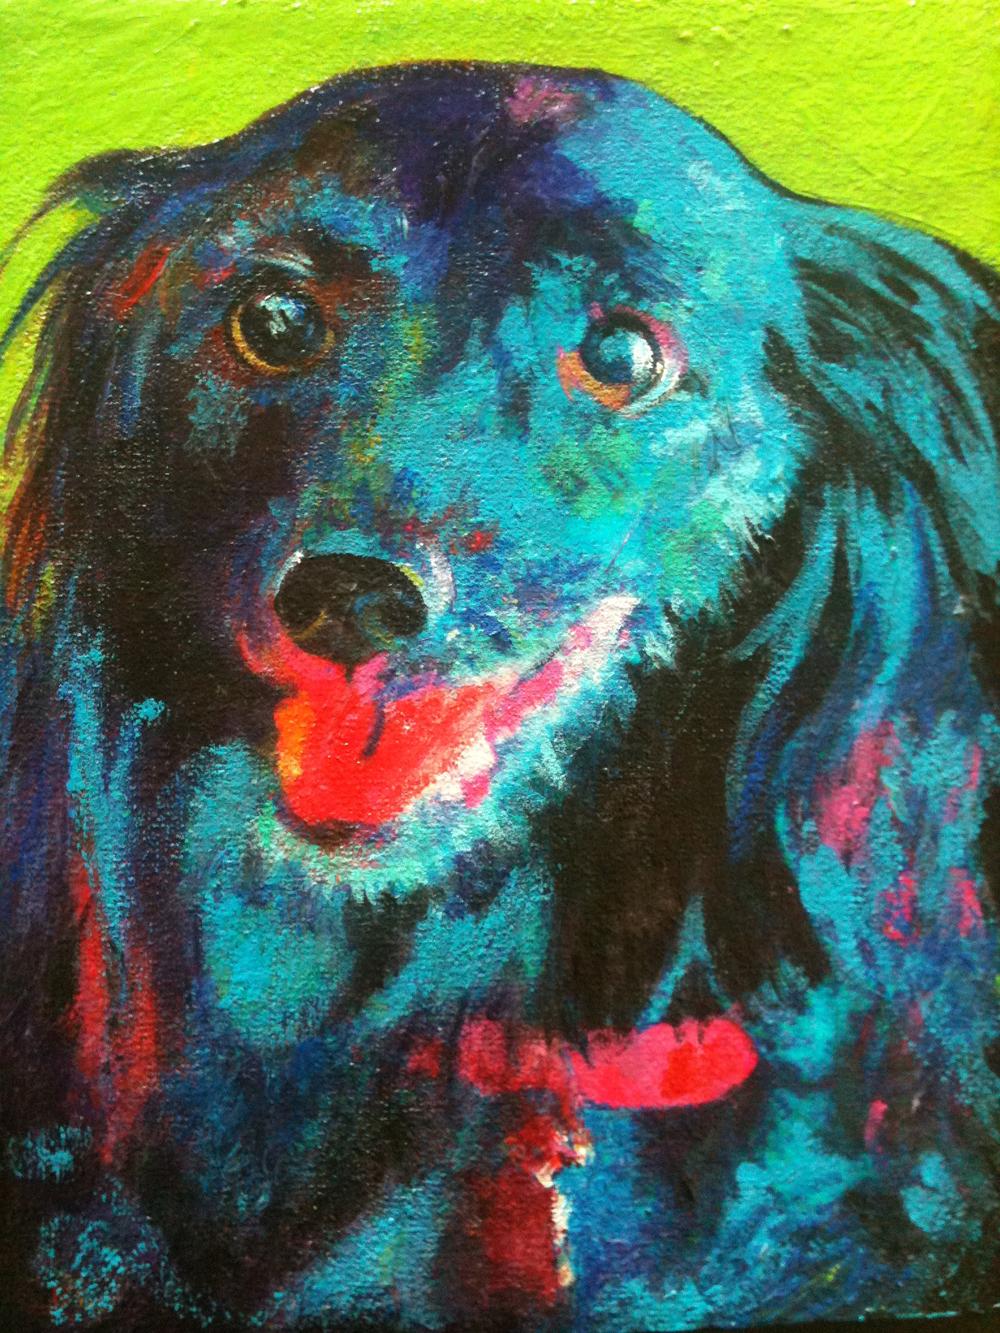 quito dog portrait lg file.jpg